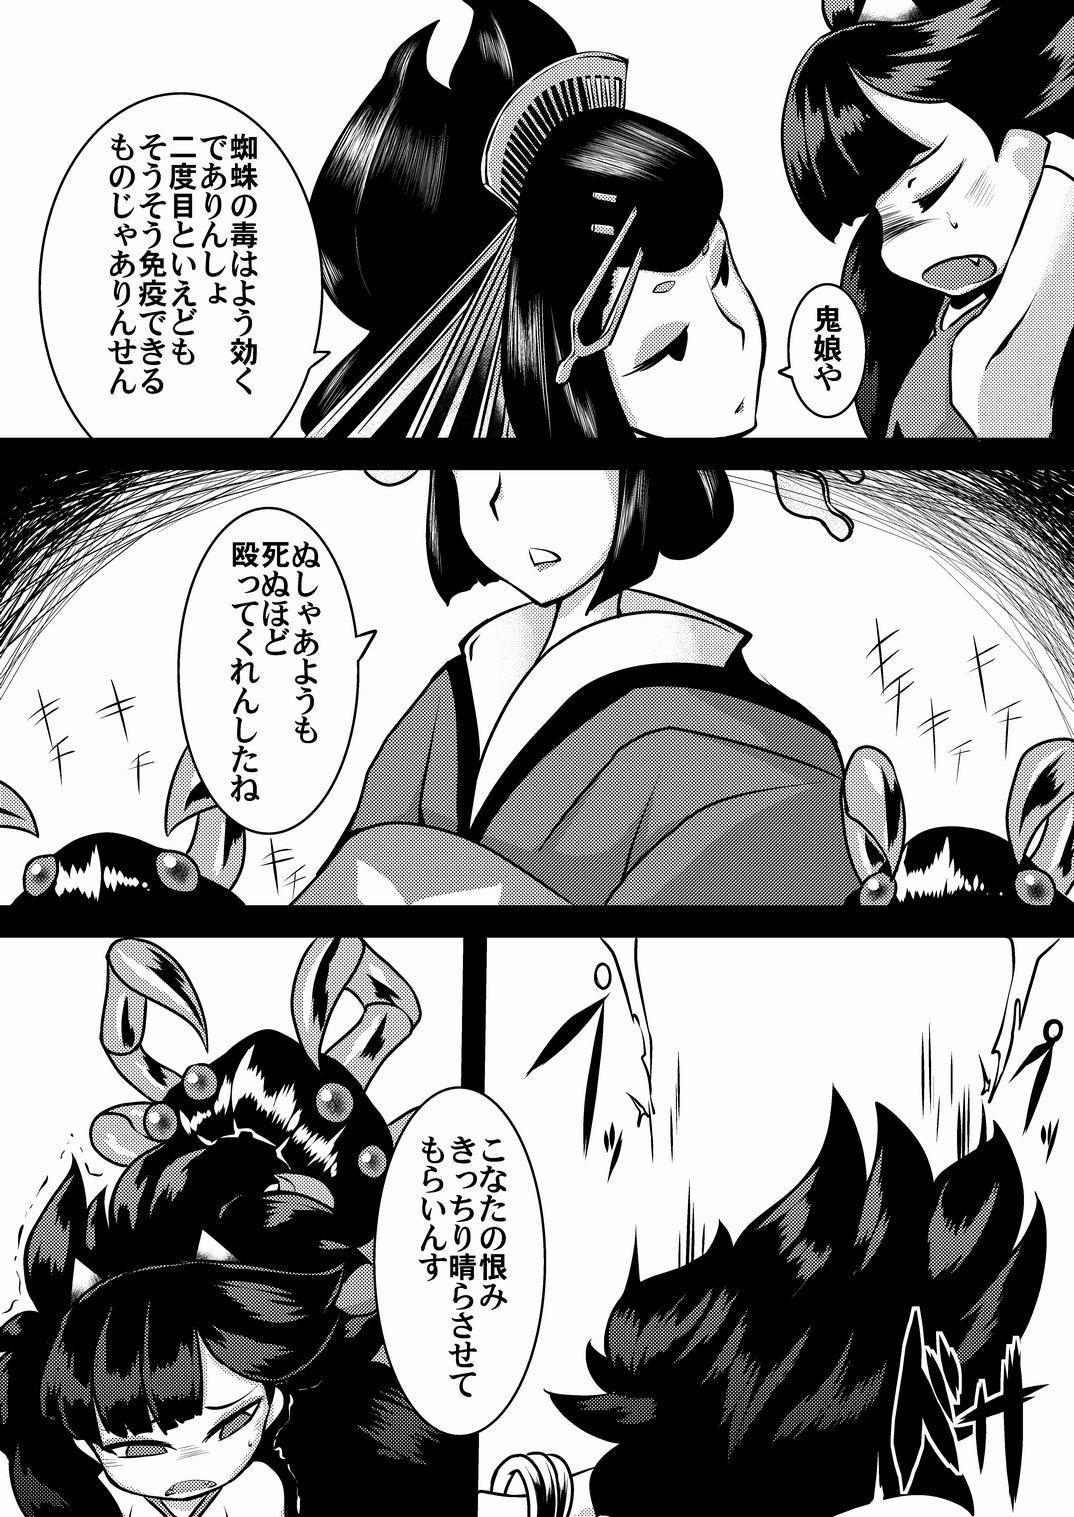 Jorōgumo no oni kan no wazawai 4